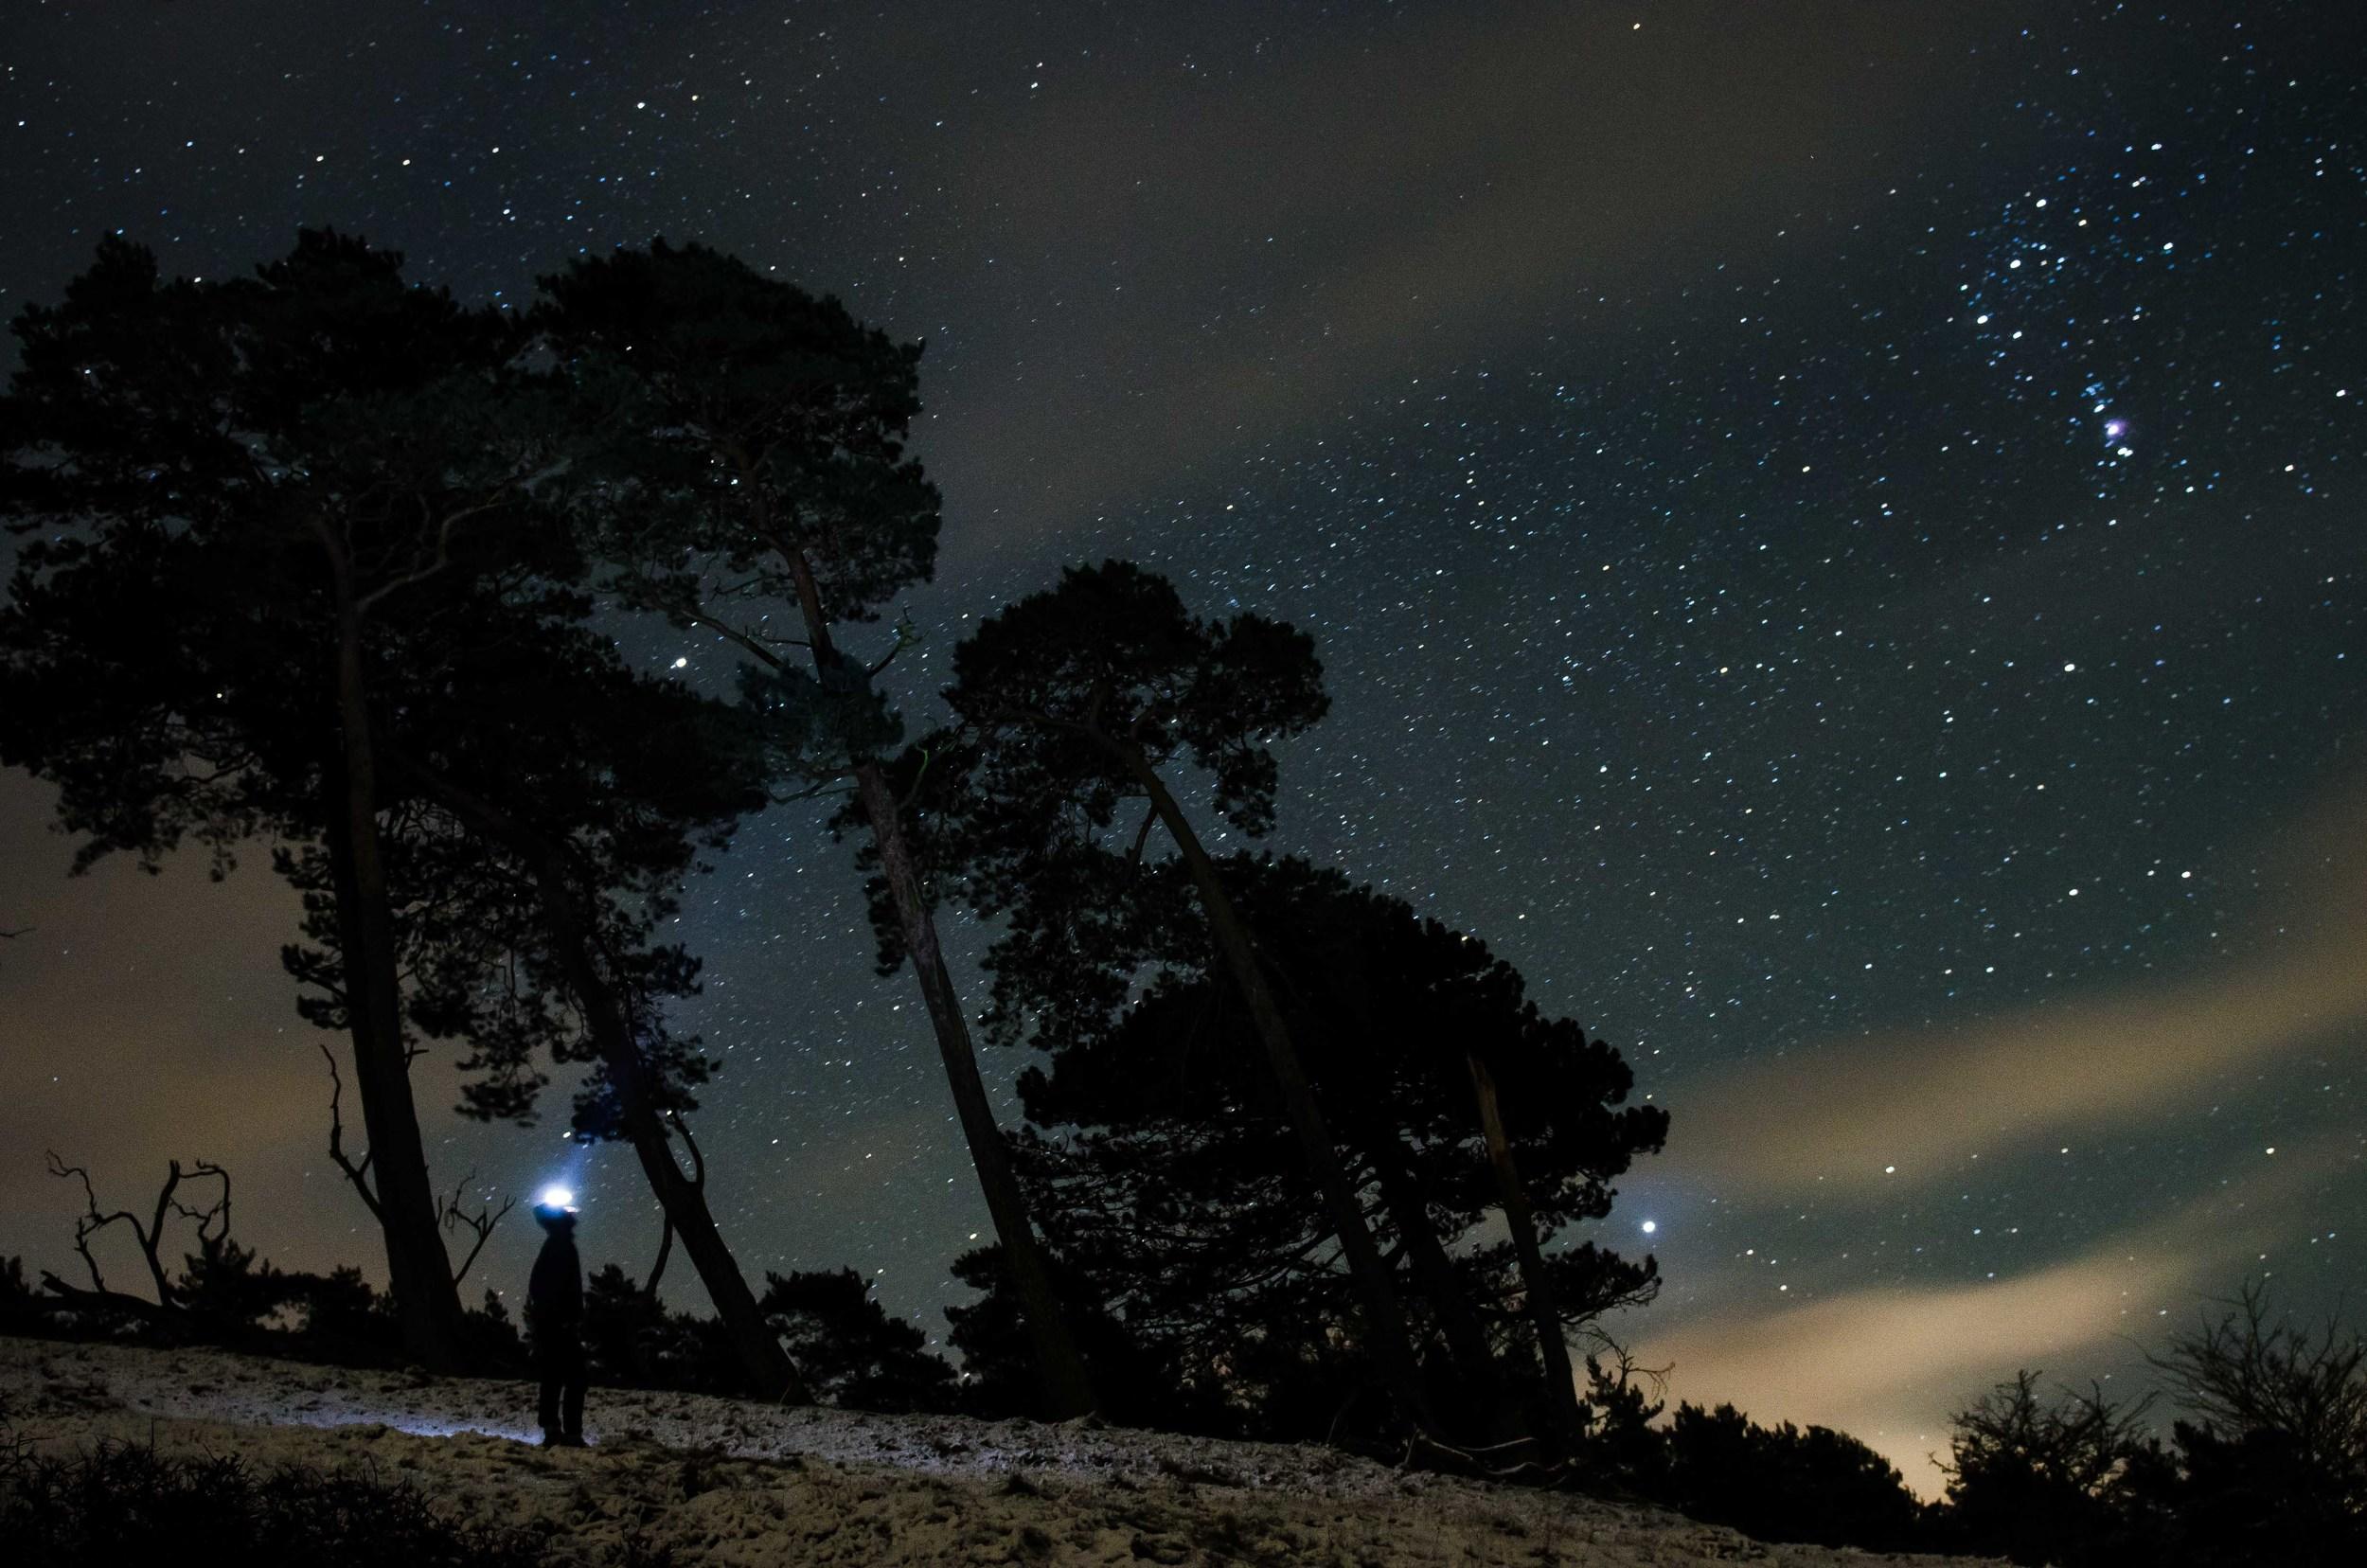 naesen-creative-star-photography-astrography-gustav-emil-thuesen-photographer